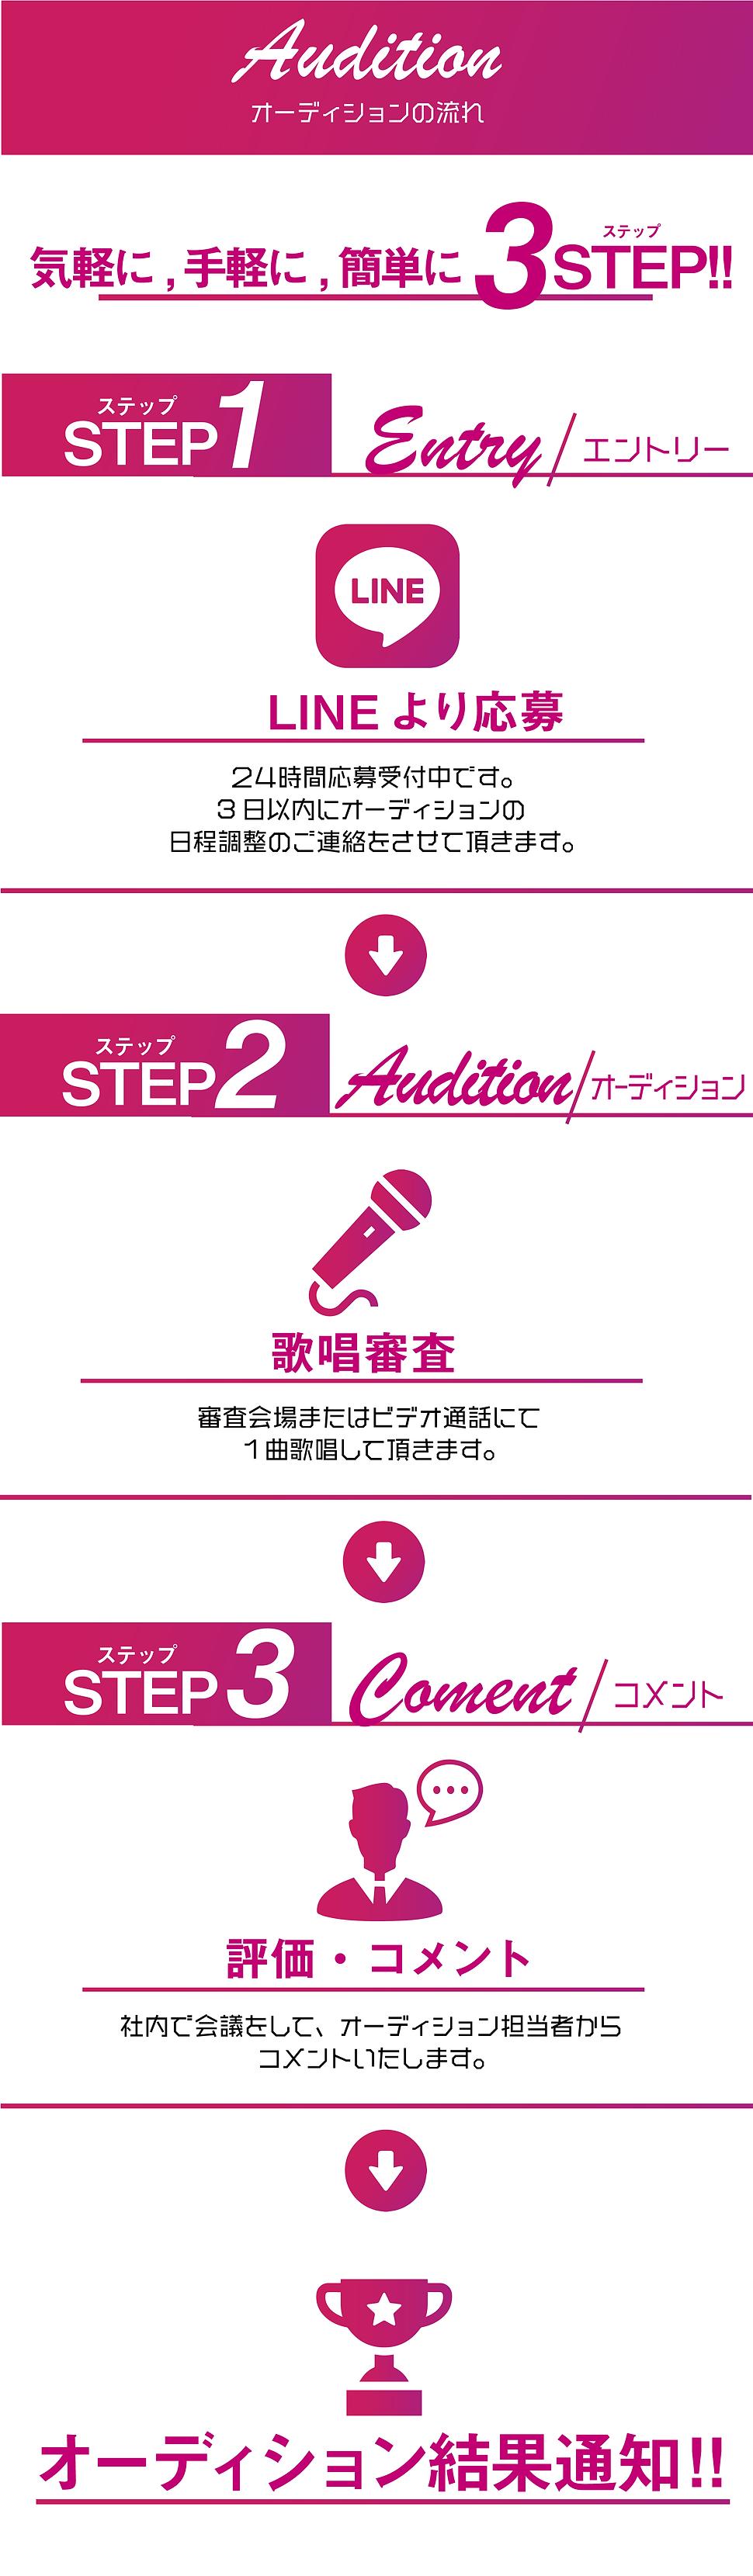 youtubeシンガーデビューオーディション審査の流れ修正-03.png